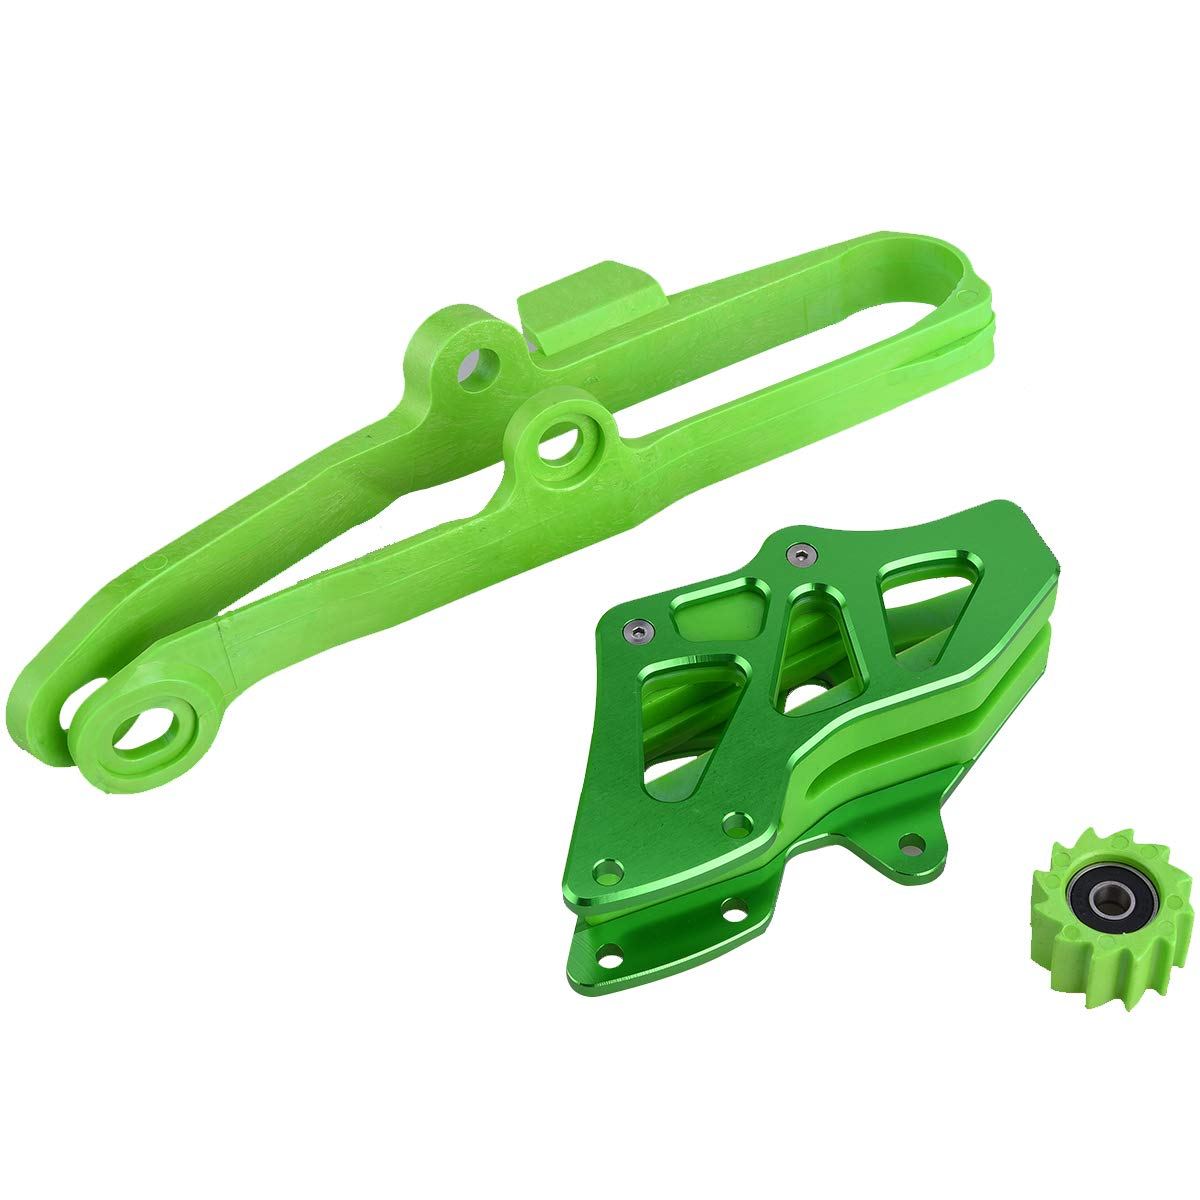 PRO CAKEN CNC Chain Slide-N-Glide Swinging Swingarm Protector for KXF250 KXF450 09-15